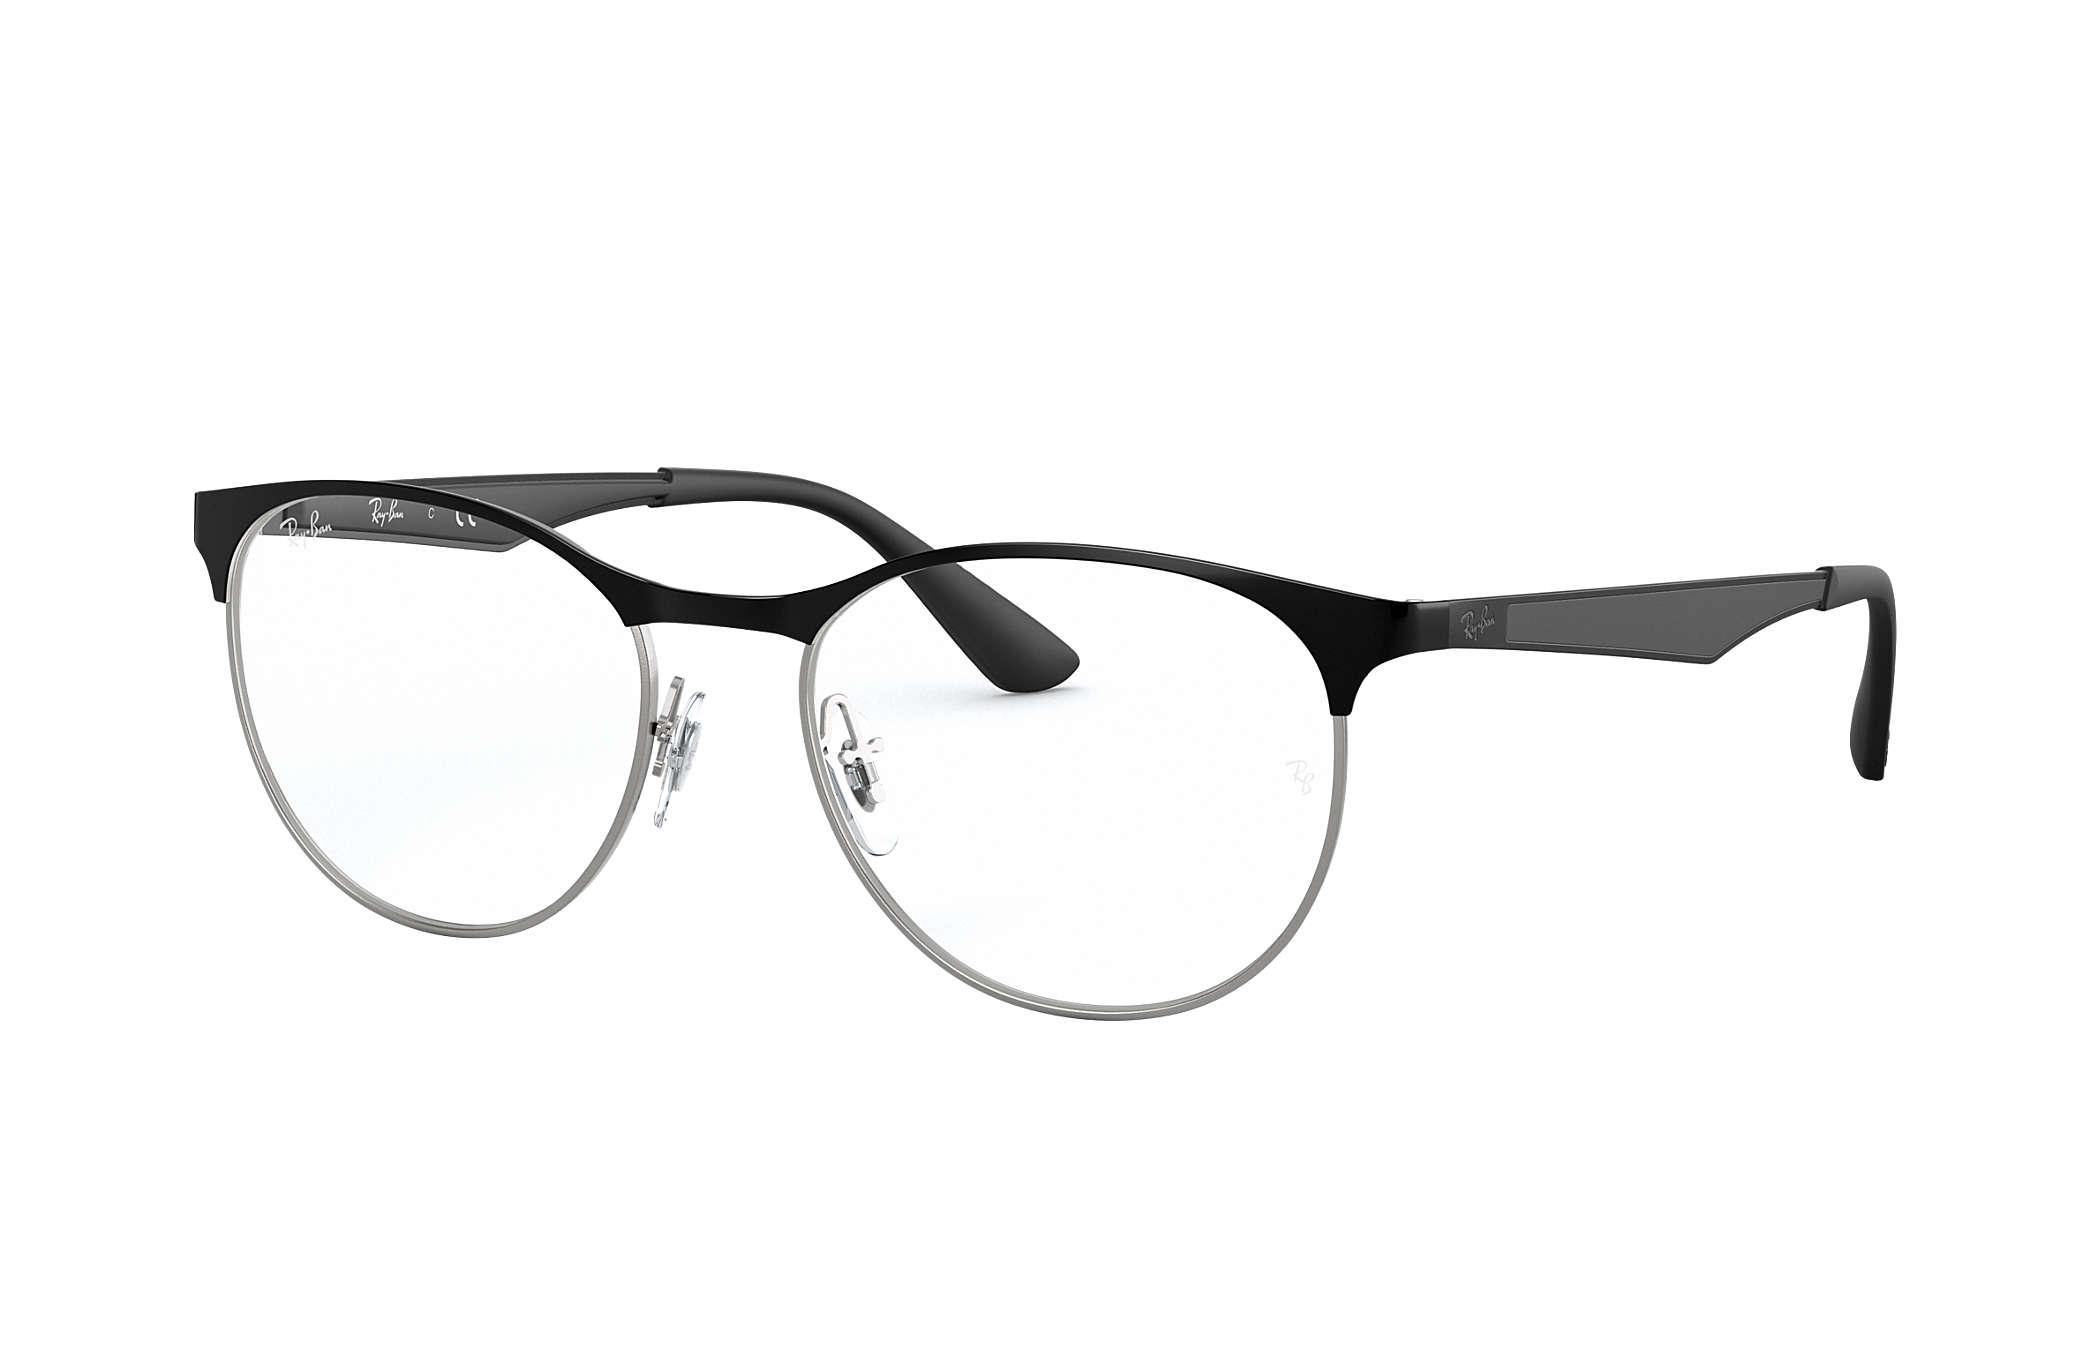 a6cc7f49495c2 Ray-Ban prescription glasses RB6365 Black - Metal - 0RX6365286151 ...